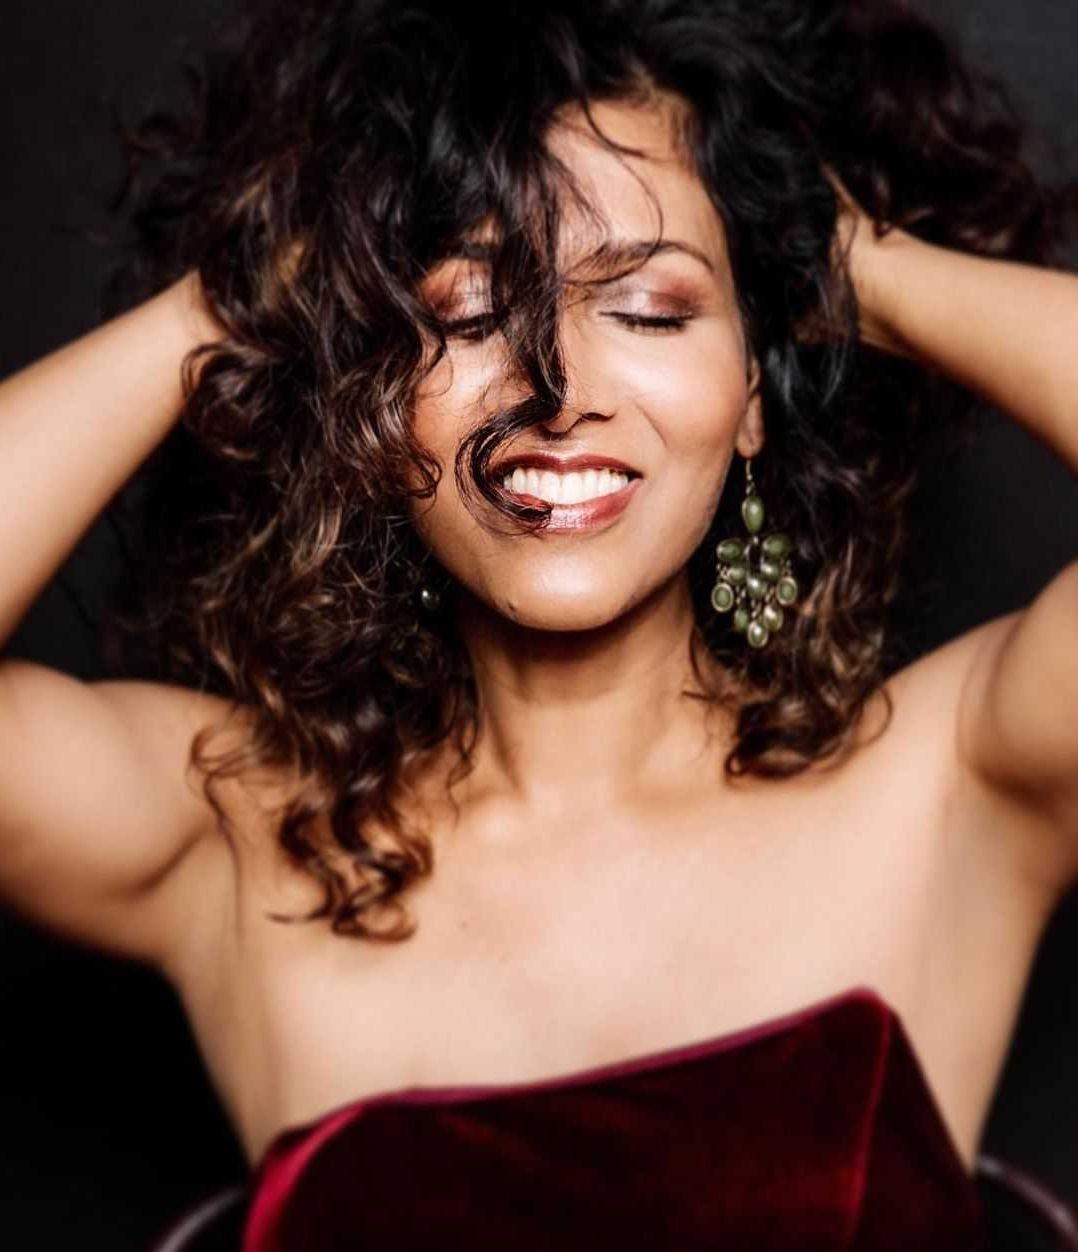 Rekha Sharma topless pics